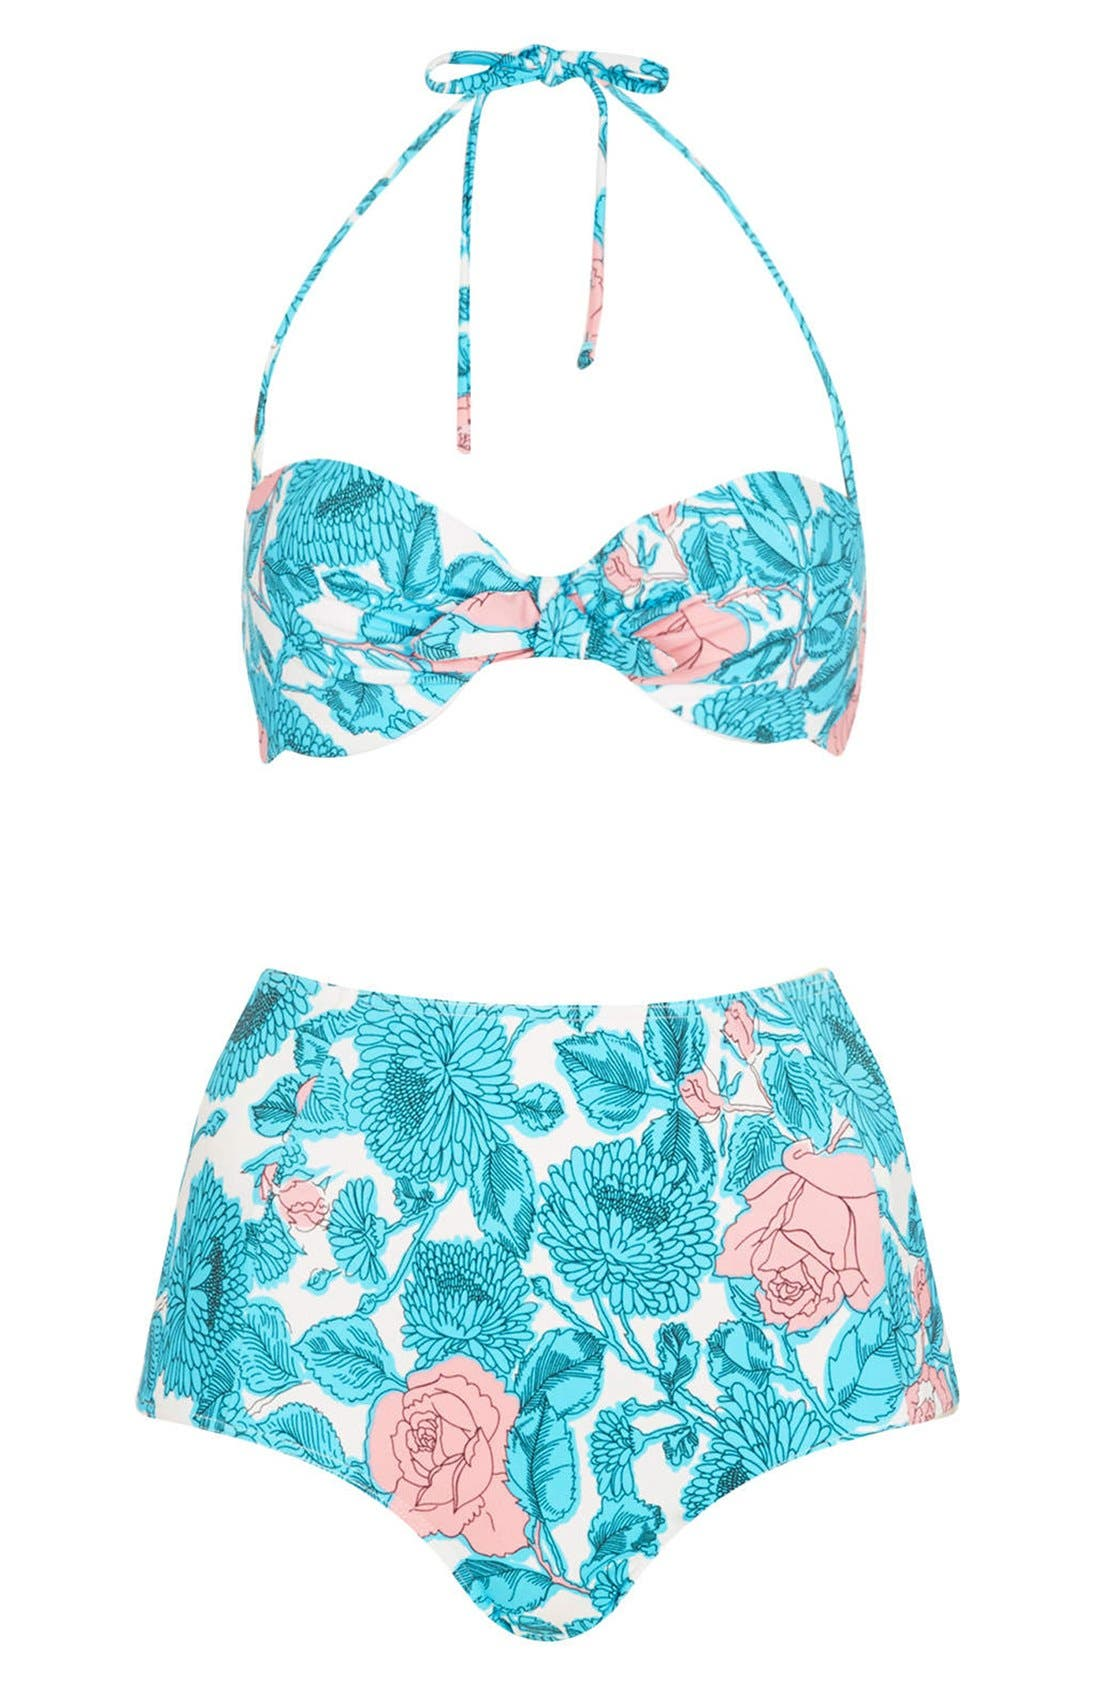 Main Image - Topshop 'Savannah' Plunge High Waist Floral Bikini